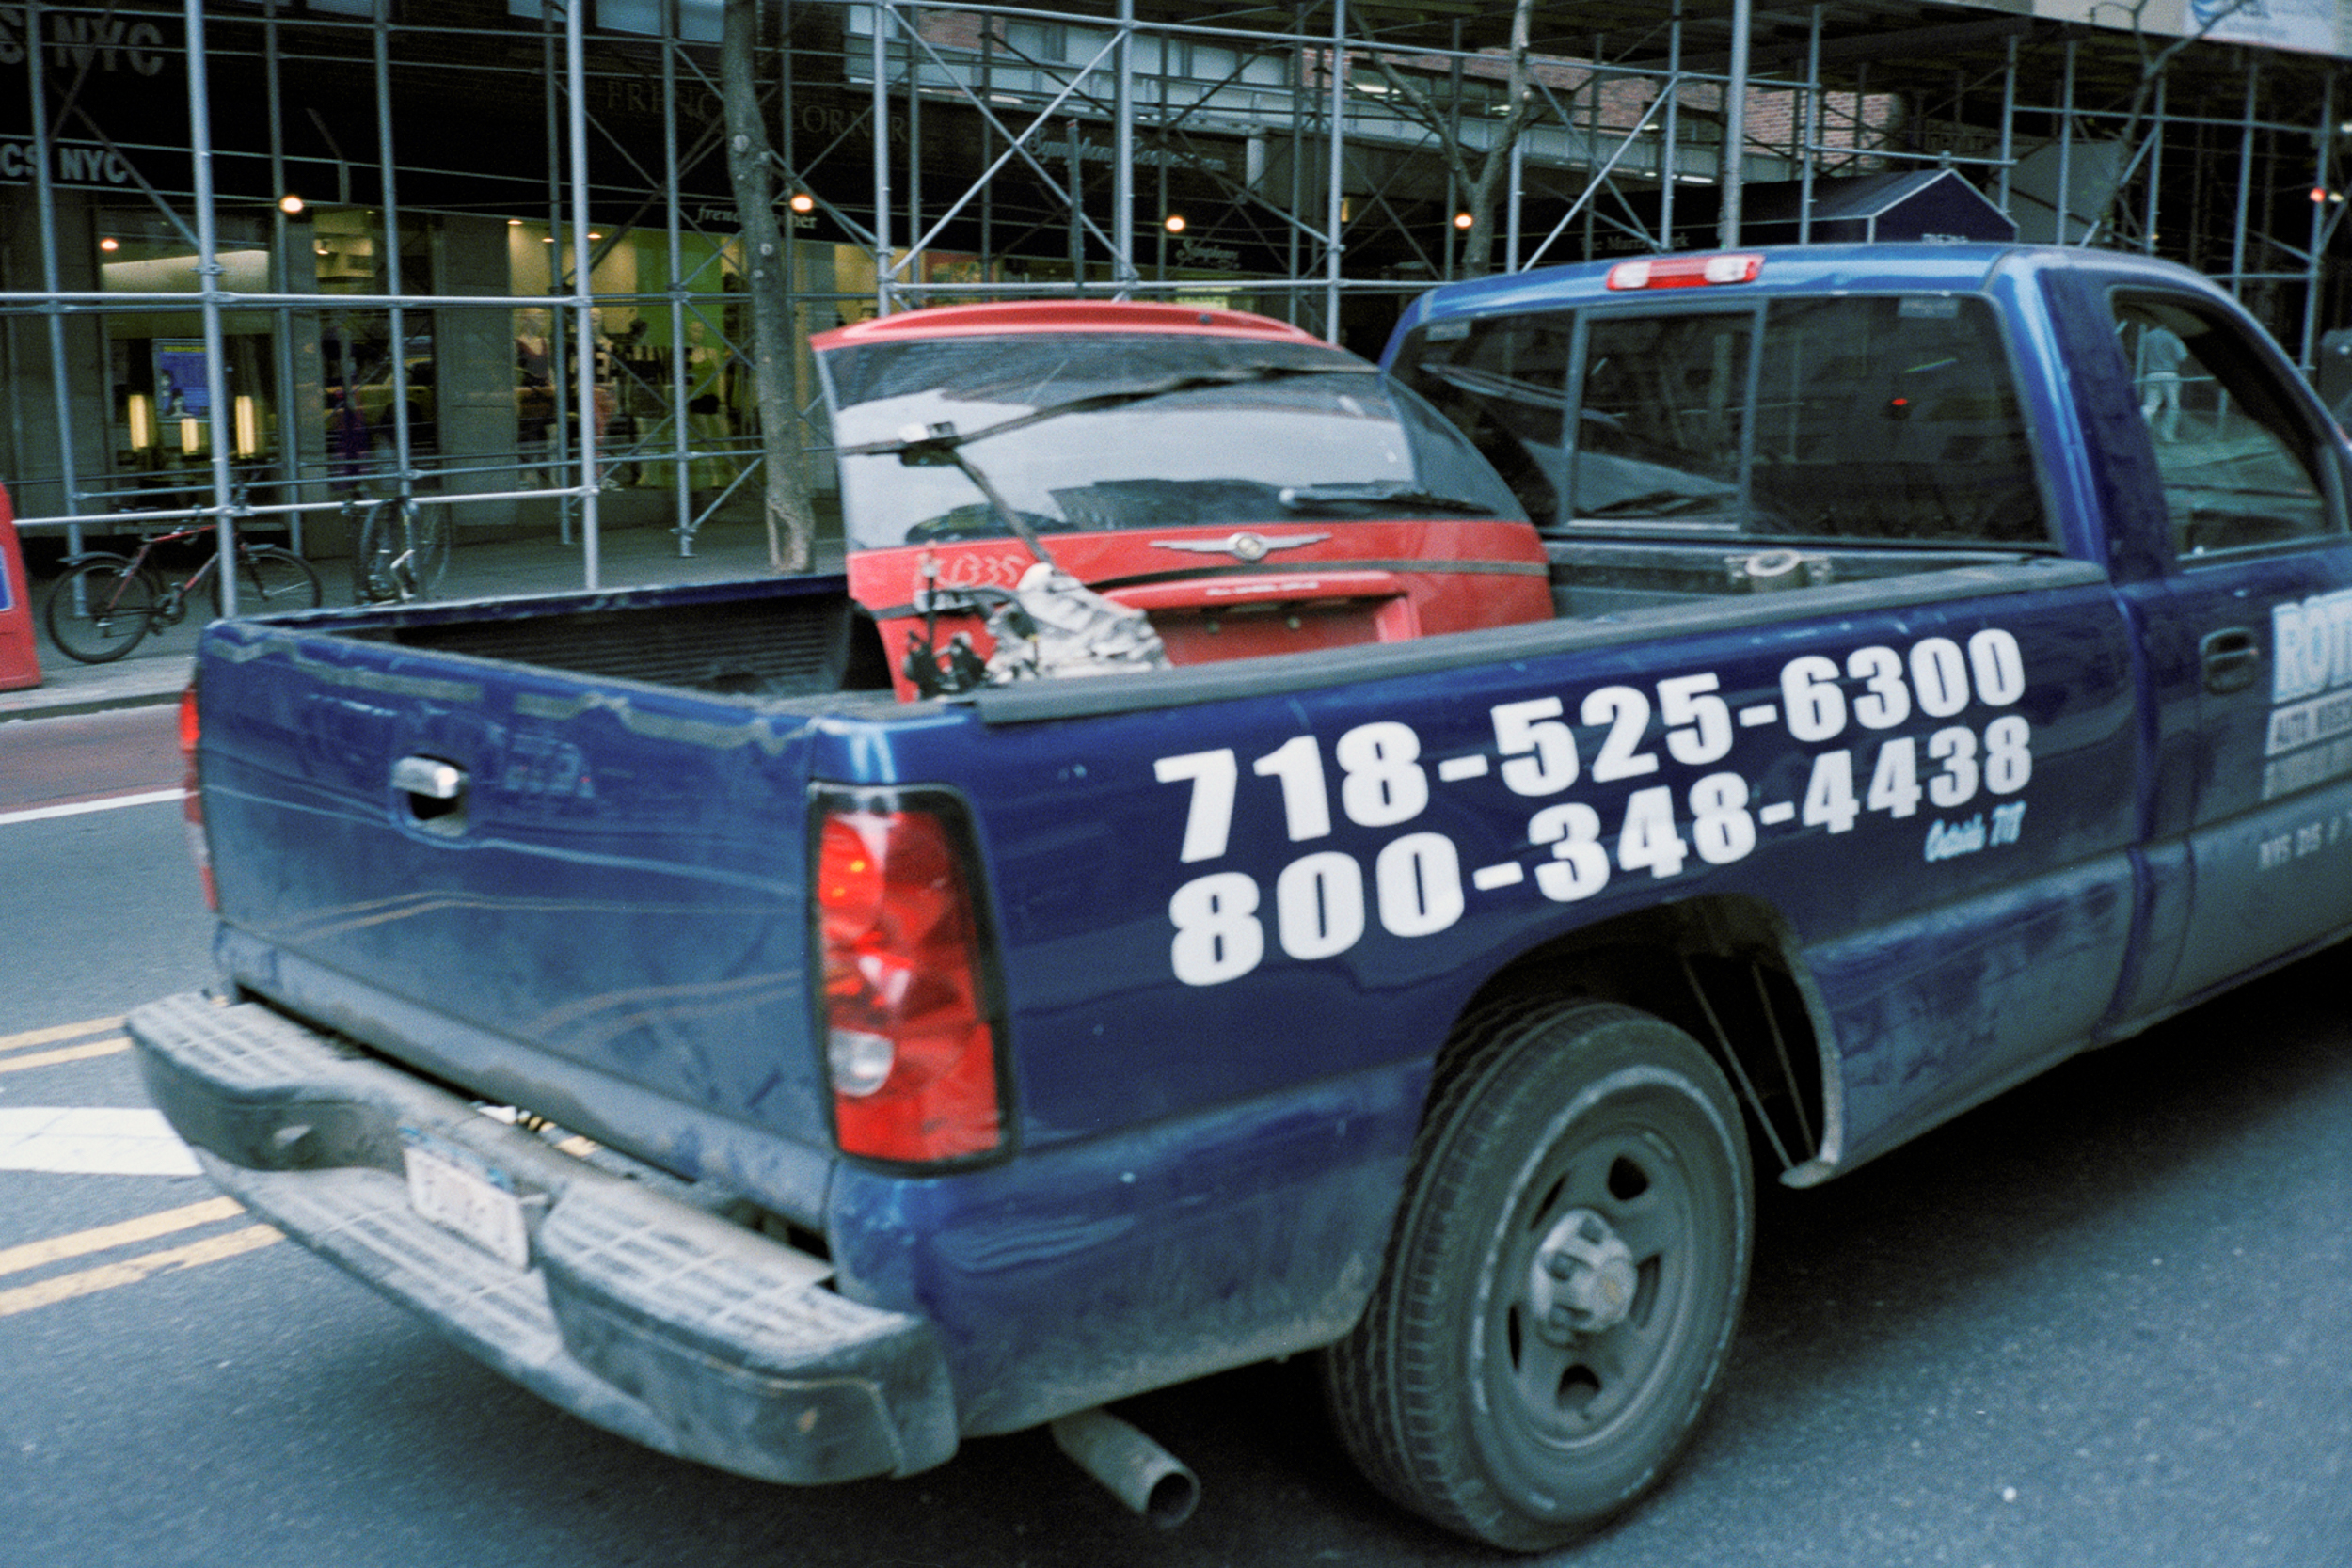 ScottMarceau_trunk truck